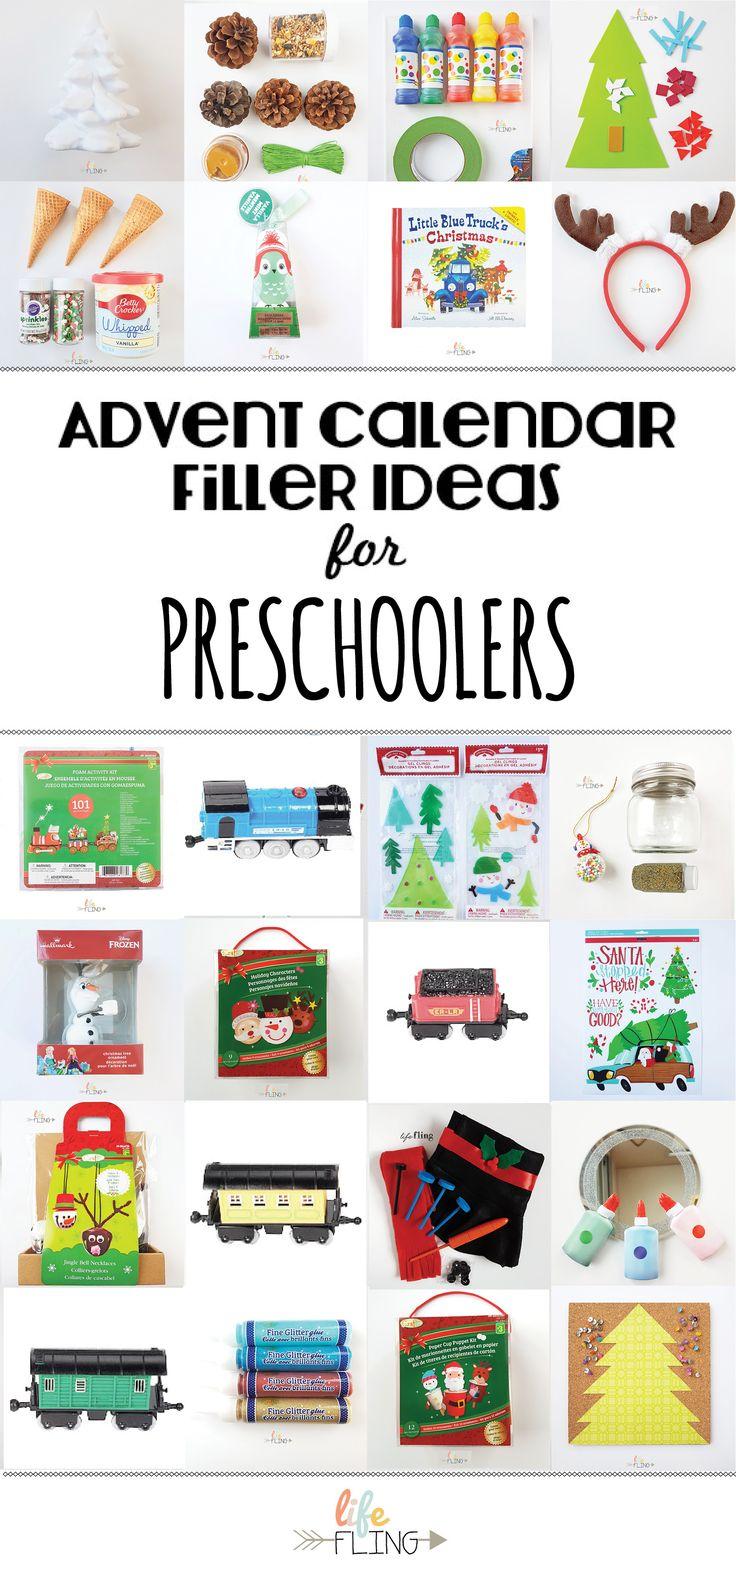 Advent Calendar Filler Ideas for Preschoolers | Life Fling